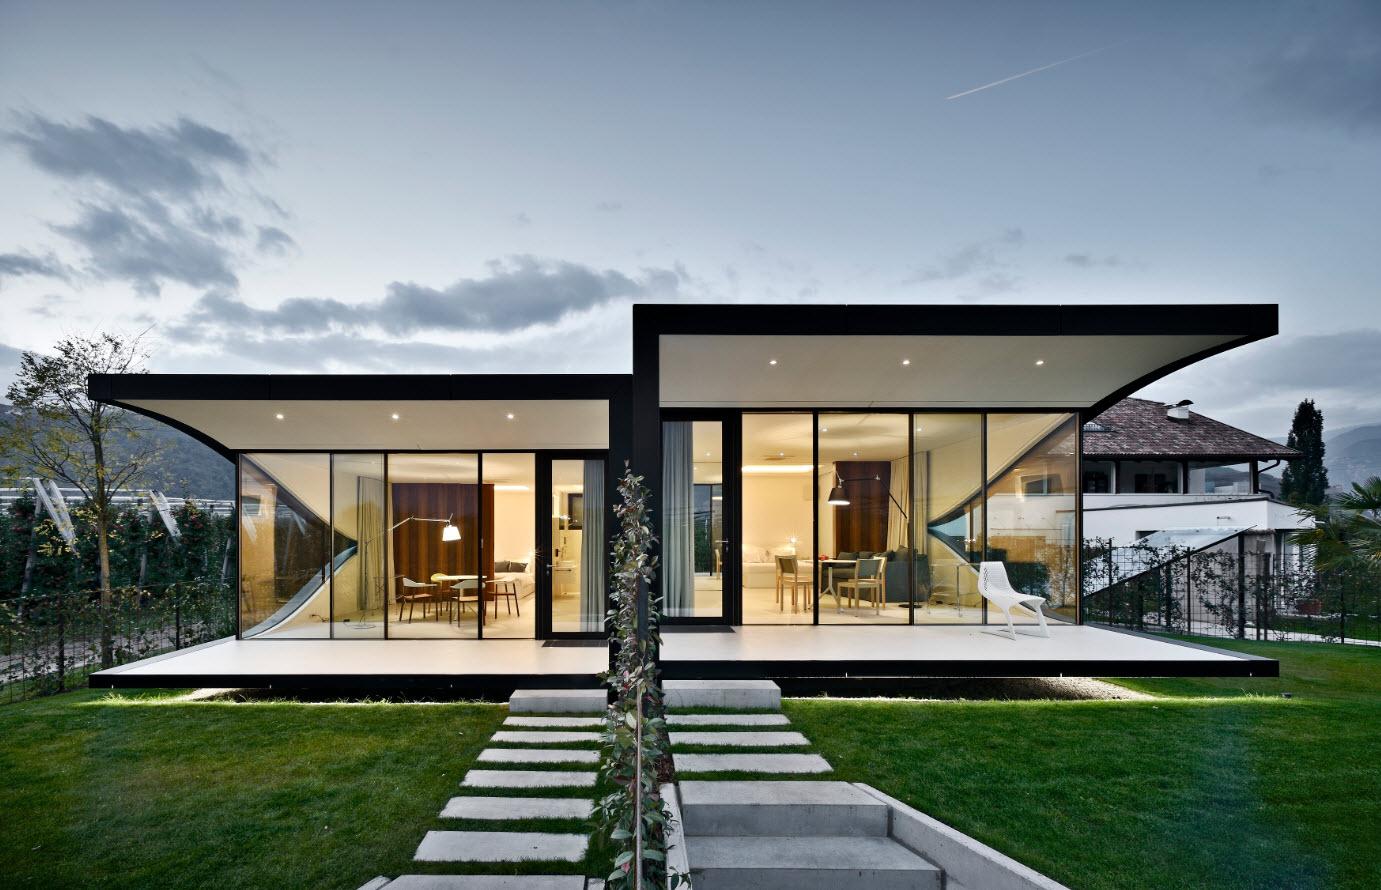 Mirror Houses - Dormir Trentin-Haut-Adige (c) Mirror Houses